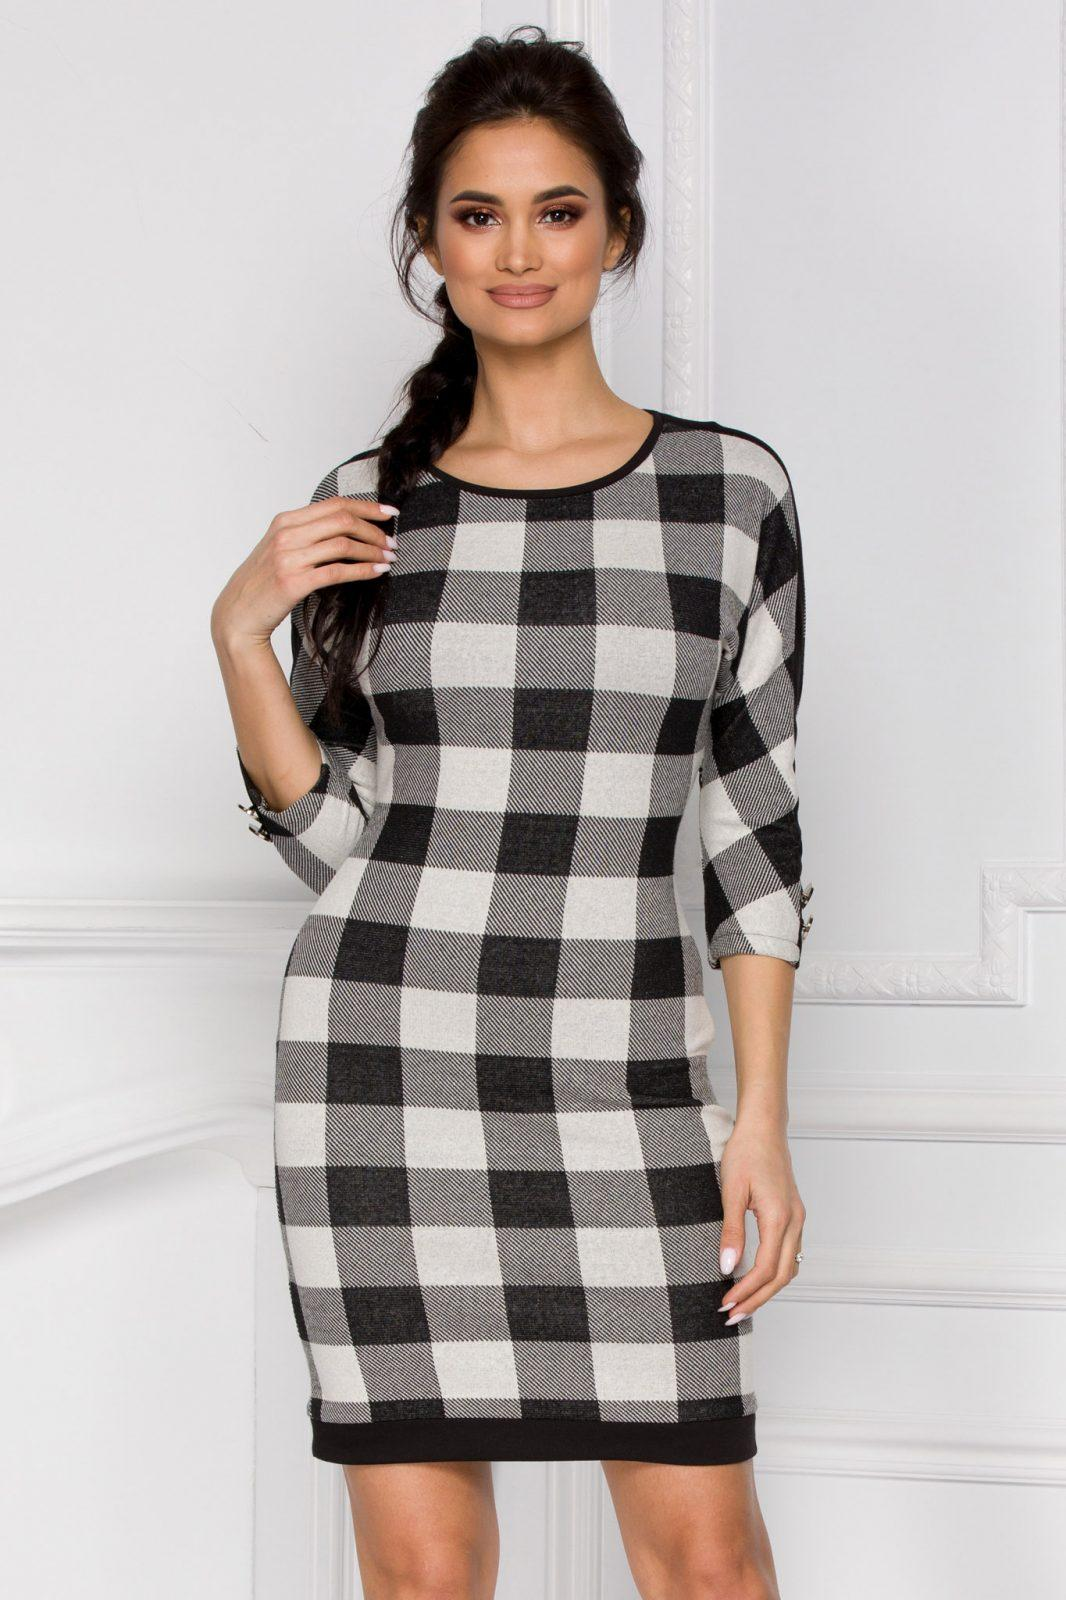 Esteffa Bicolore Dress